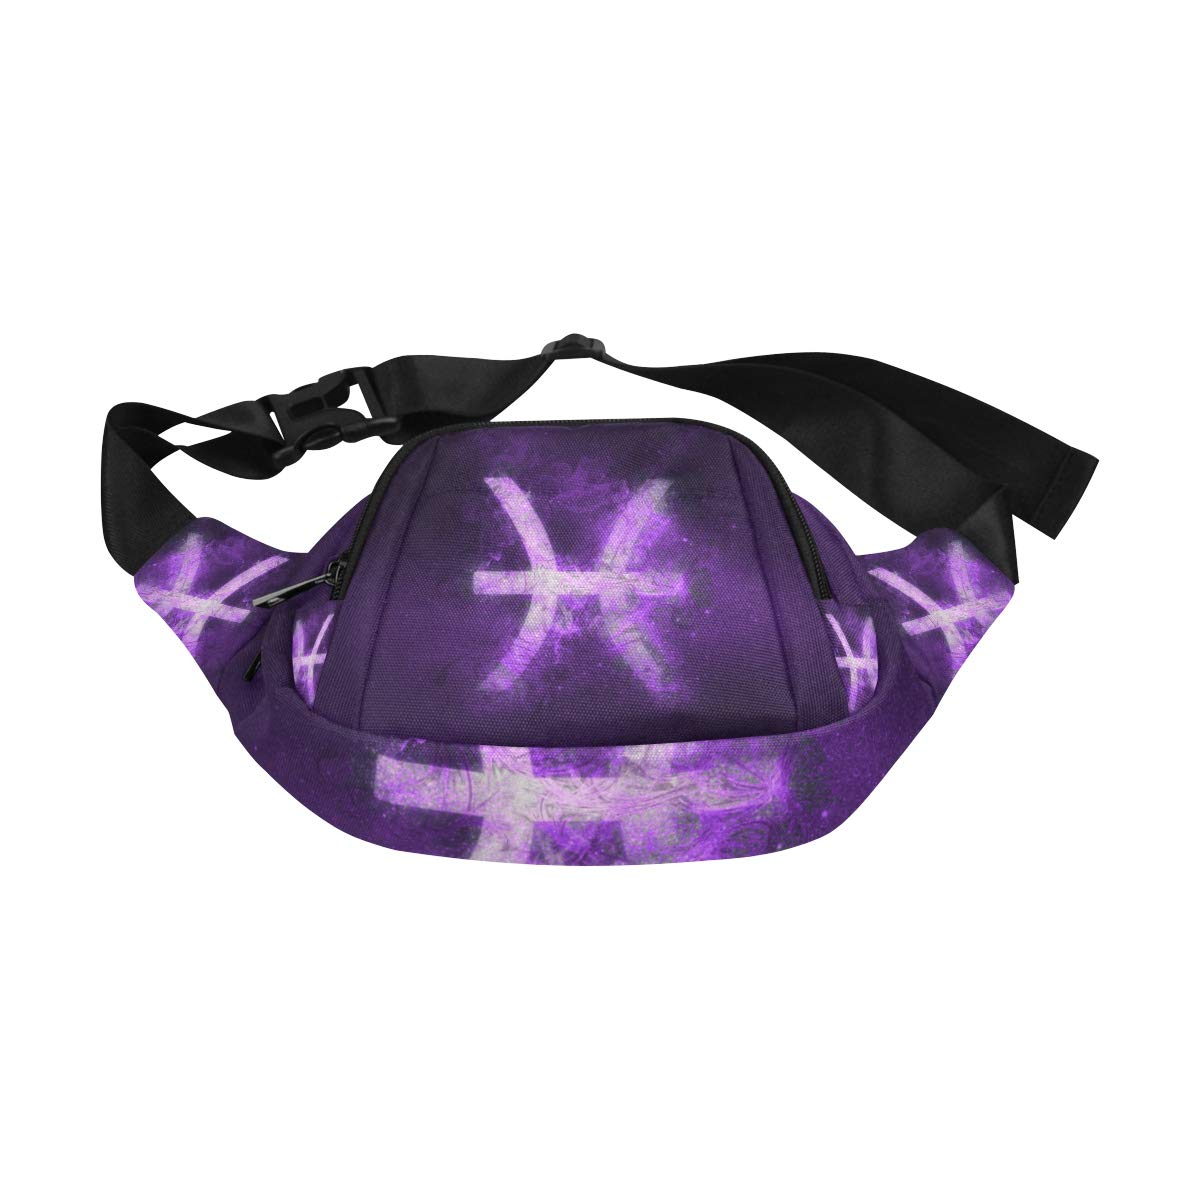 Zodiac Zodiac Sign Pisces Fenny Packs Waist Bags Adjustable Belt Waterproof Nylon Travel Running Sport Vacation Party For Men Women Boys Girls Kids